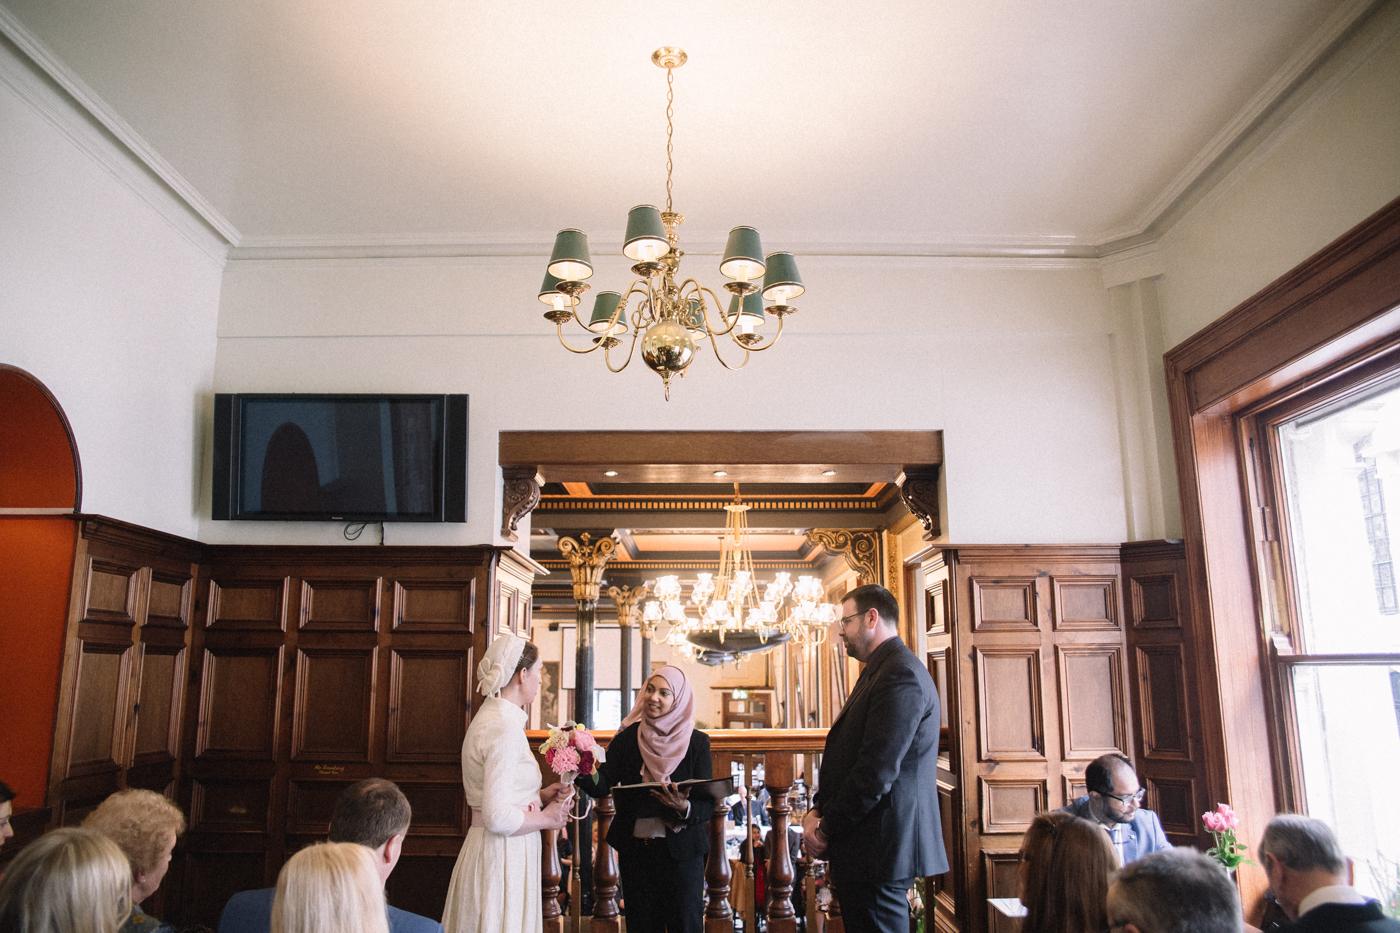 knights-templar-london-city-centre-wedding-photographer-charing-cross-creative-0024.jpg